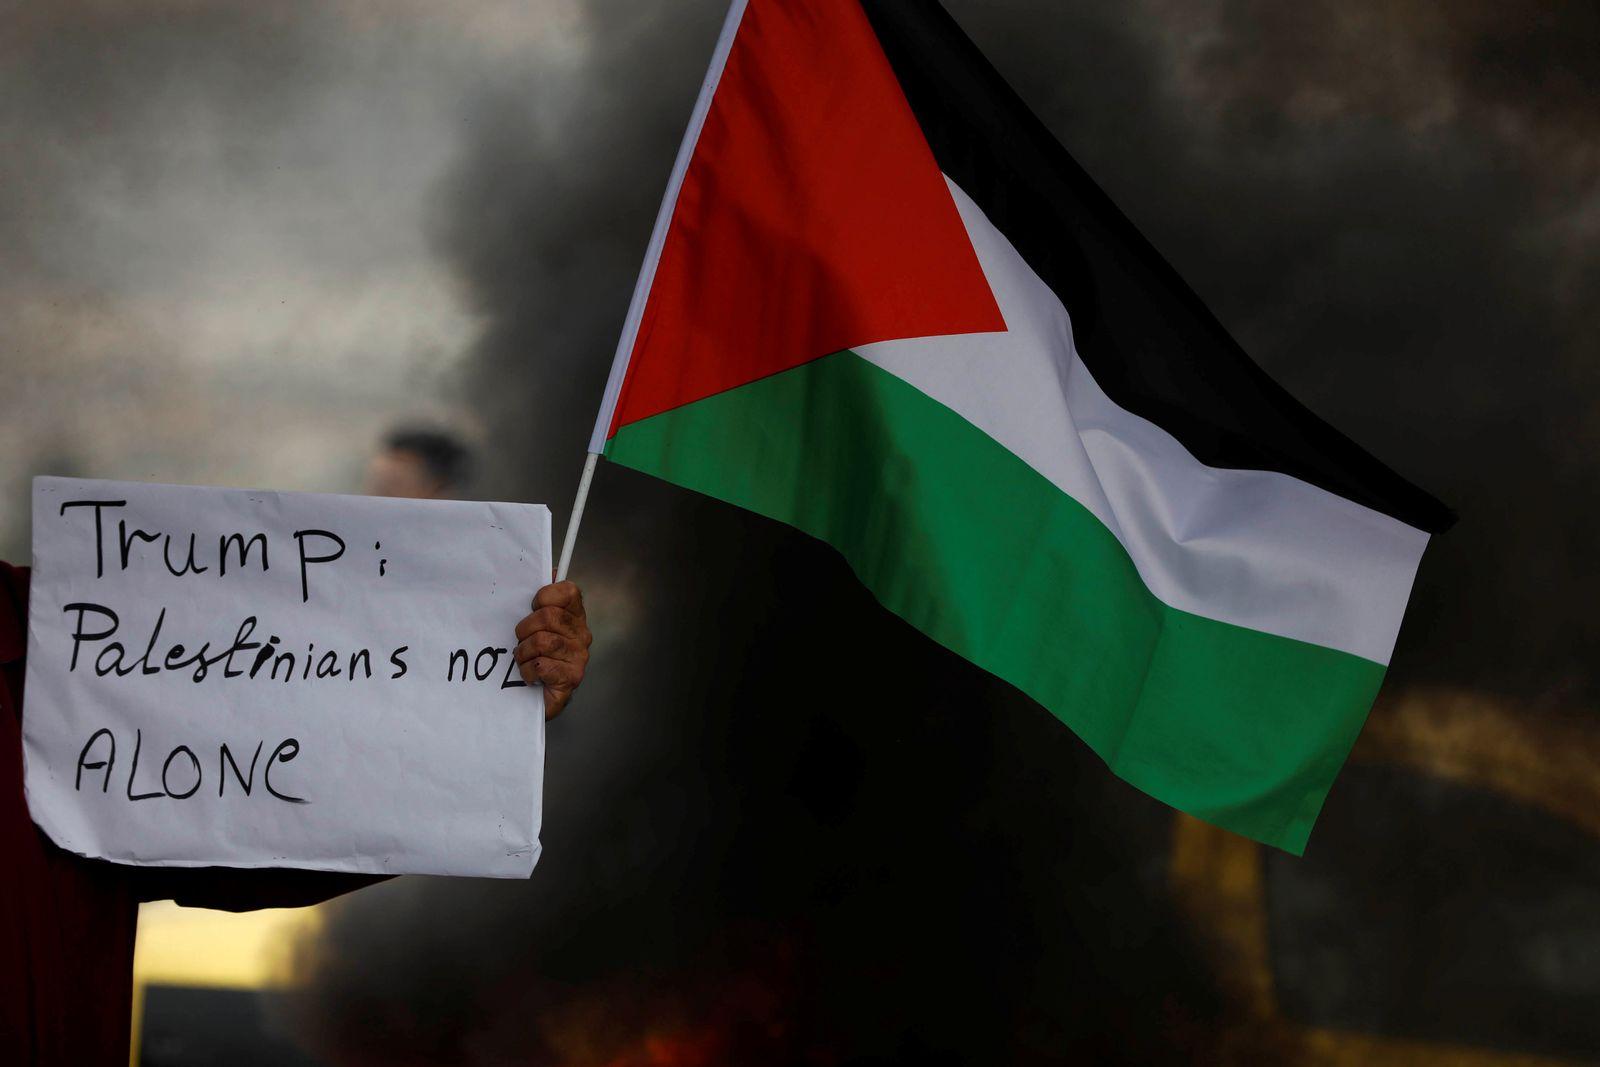 USA-TRUMP/ISRAEL-PALESTINIANS